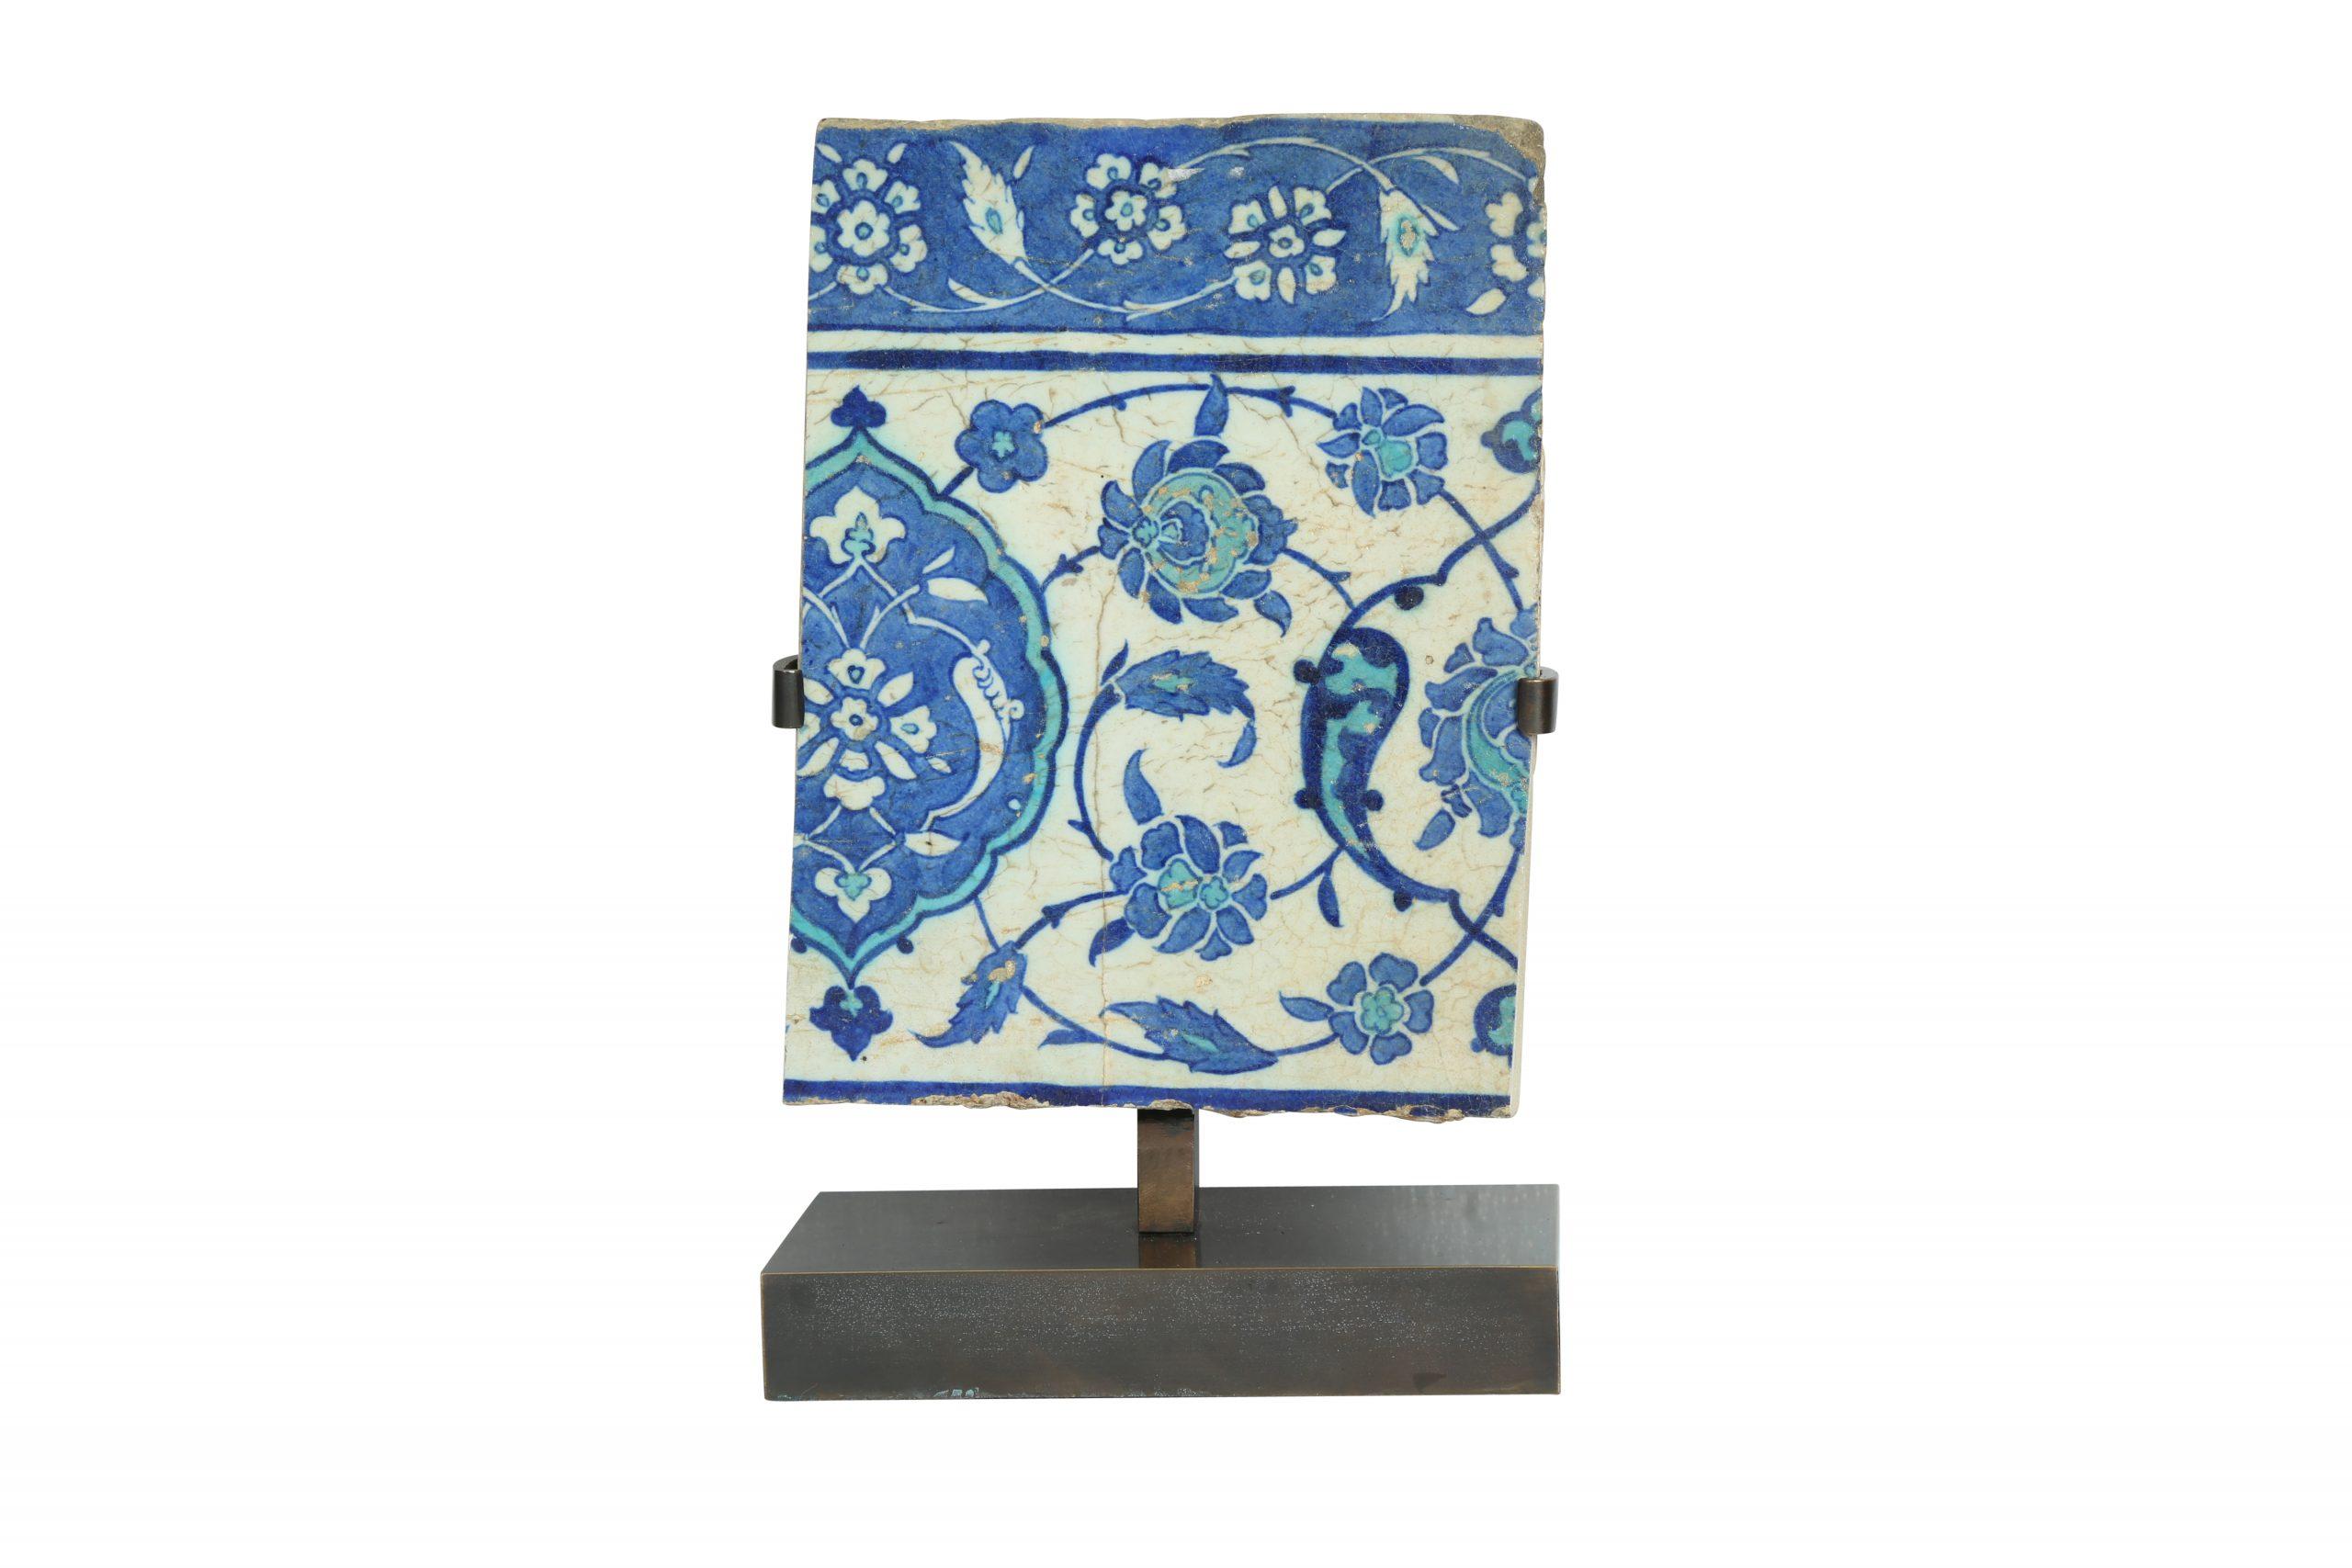 An iznik blue and turquoise pottery tile fragment. Ottoman Turkey, 16th century. Estimate £800 - £1,200